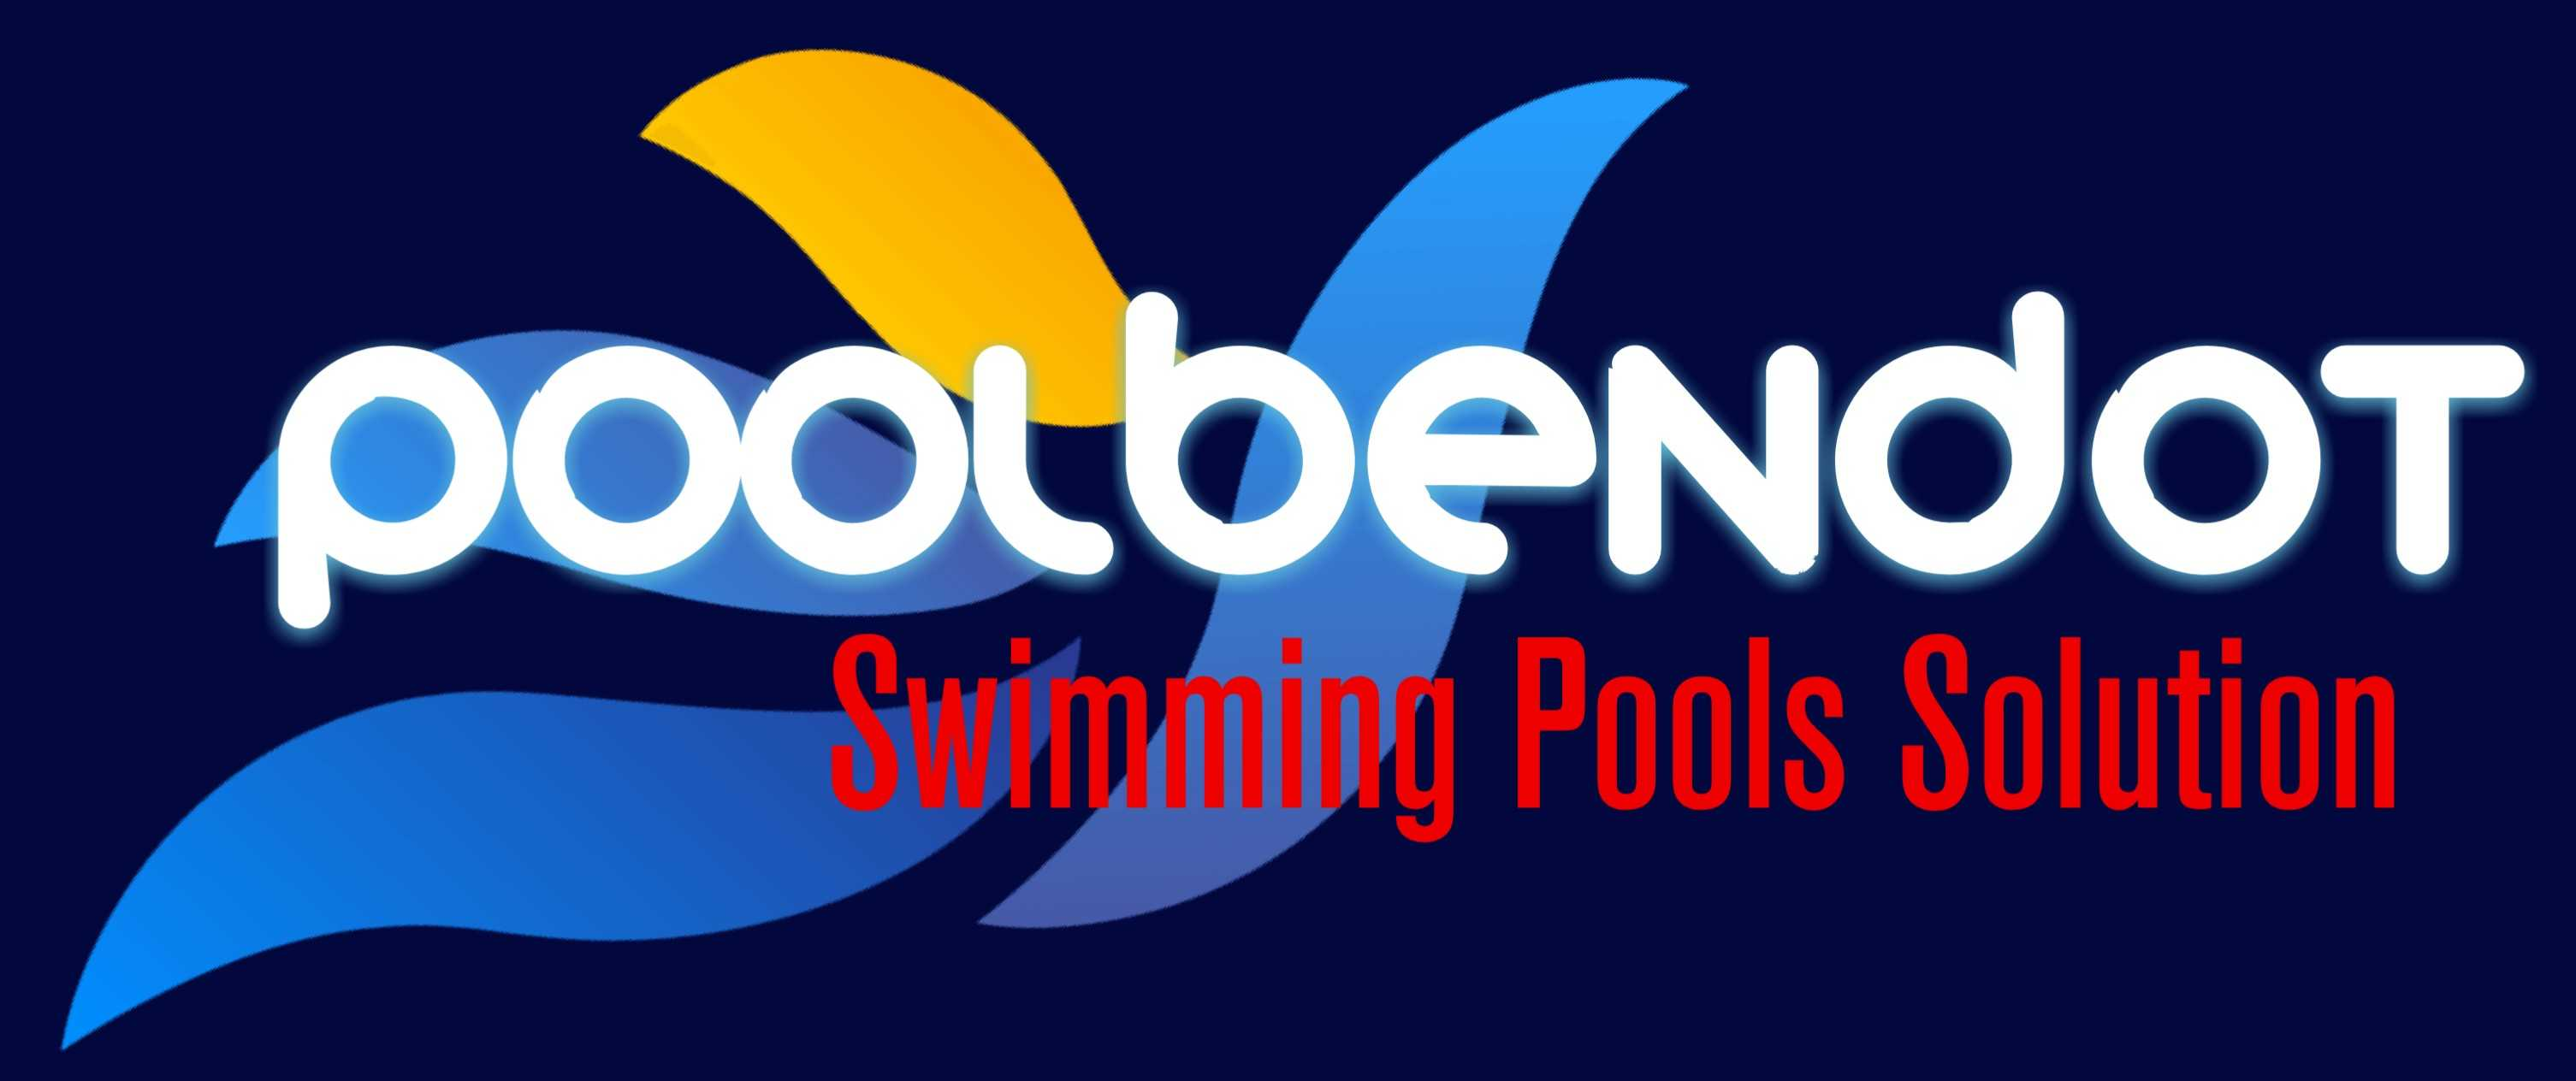 logo poolbendot hitam